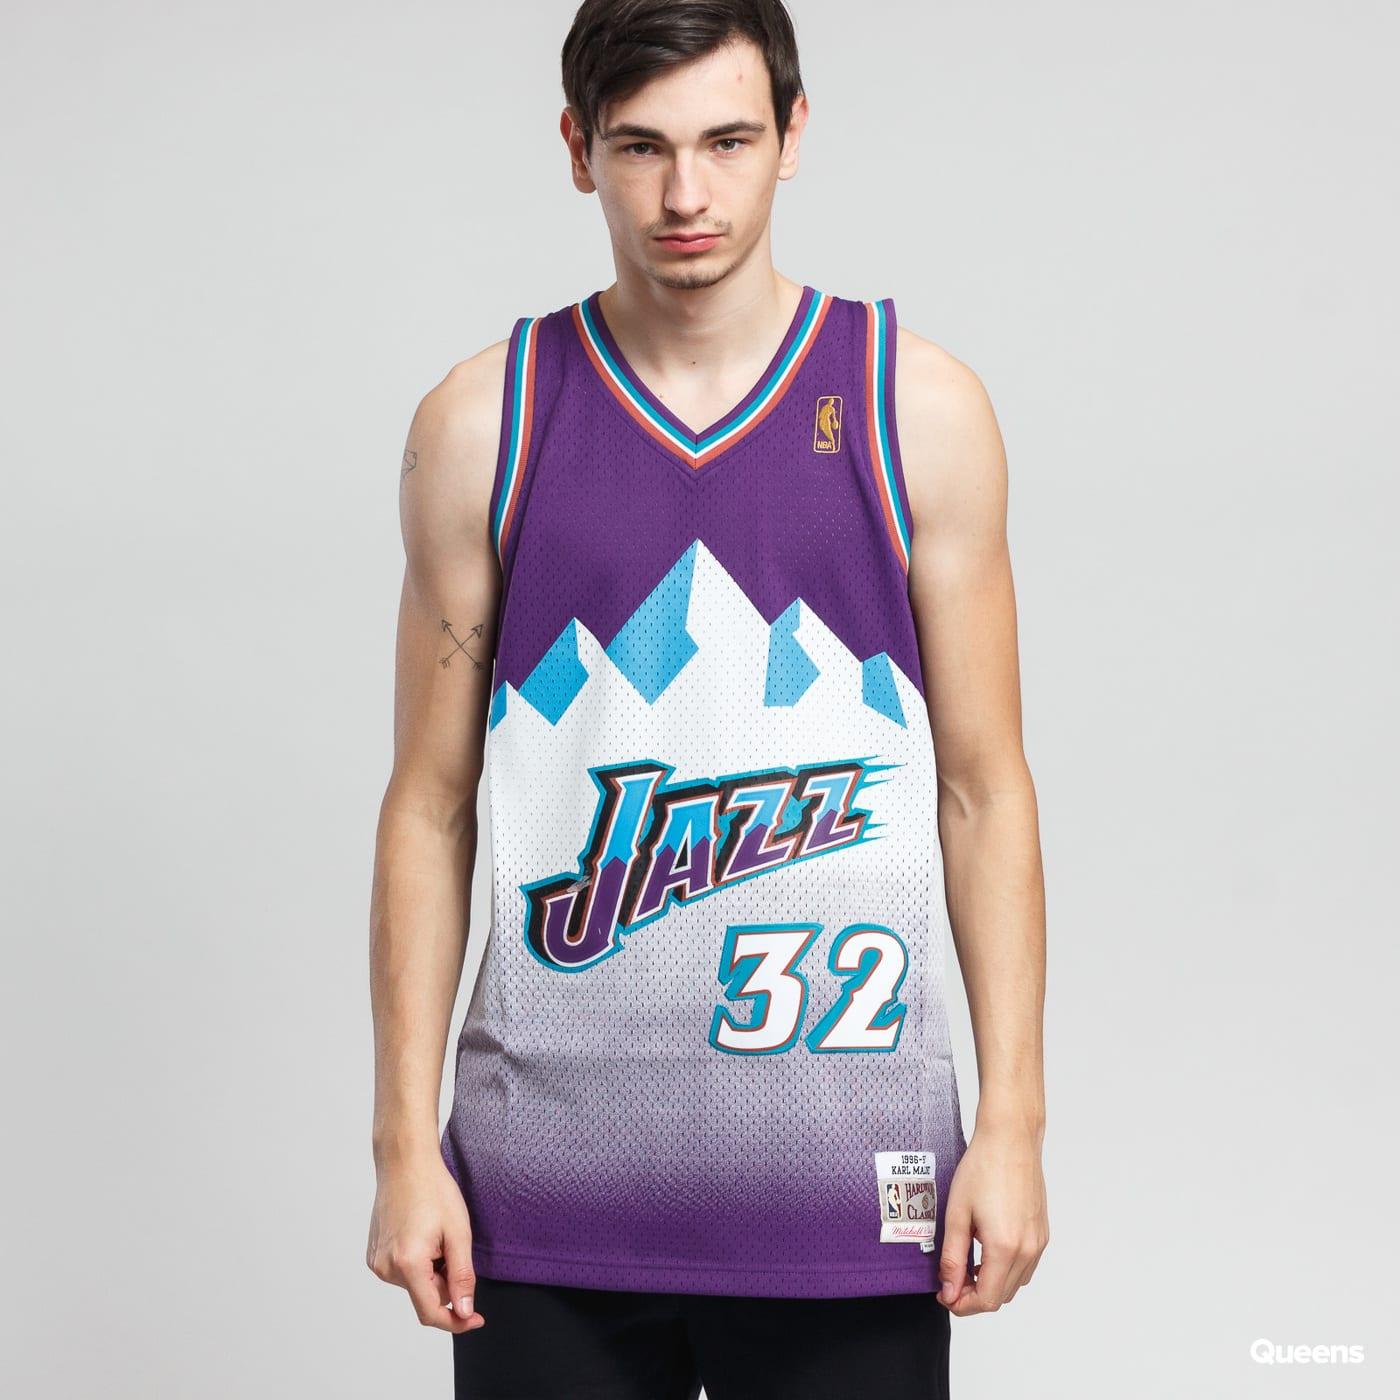 meet cb60b 56a23 Mitchell & Ness NBA Swingman Jersey Utah Jazz purple / white